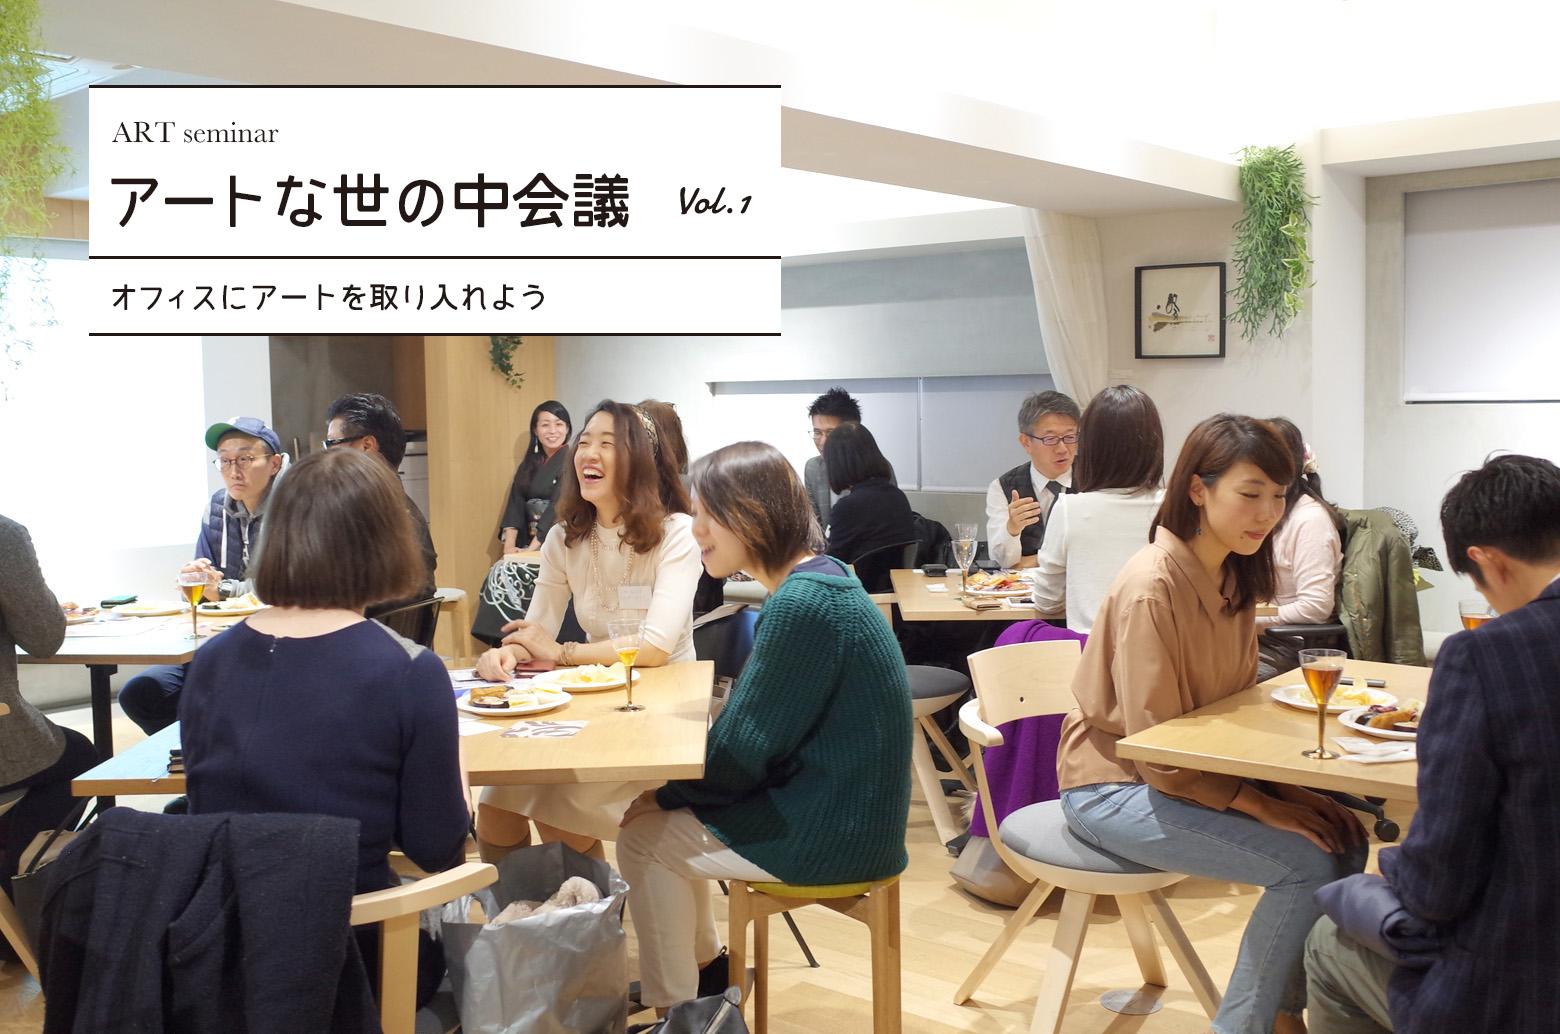 【ART seminar】アートな世の中会議 Vol.1 〜オフィスにアートを取り入れよう〜